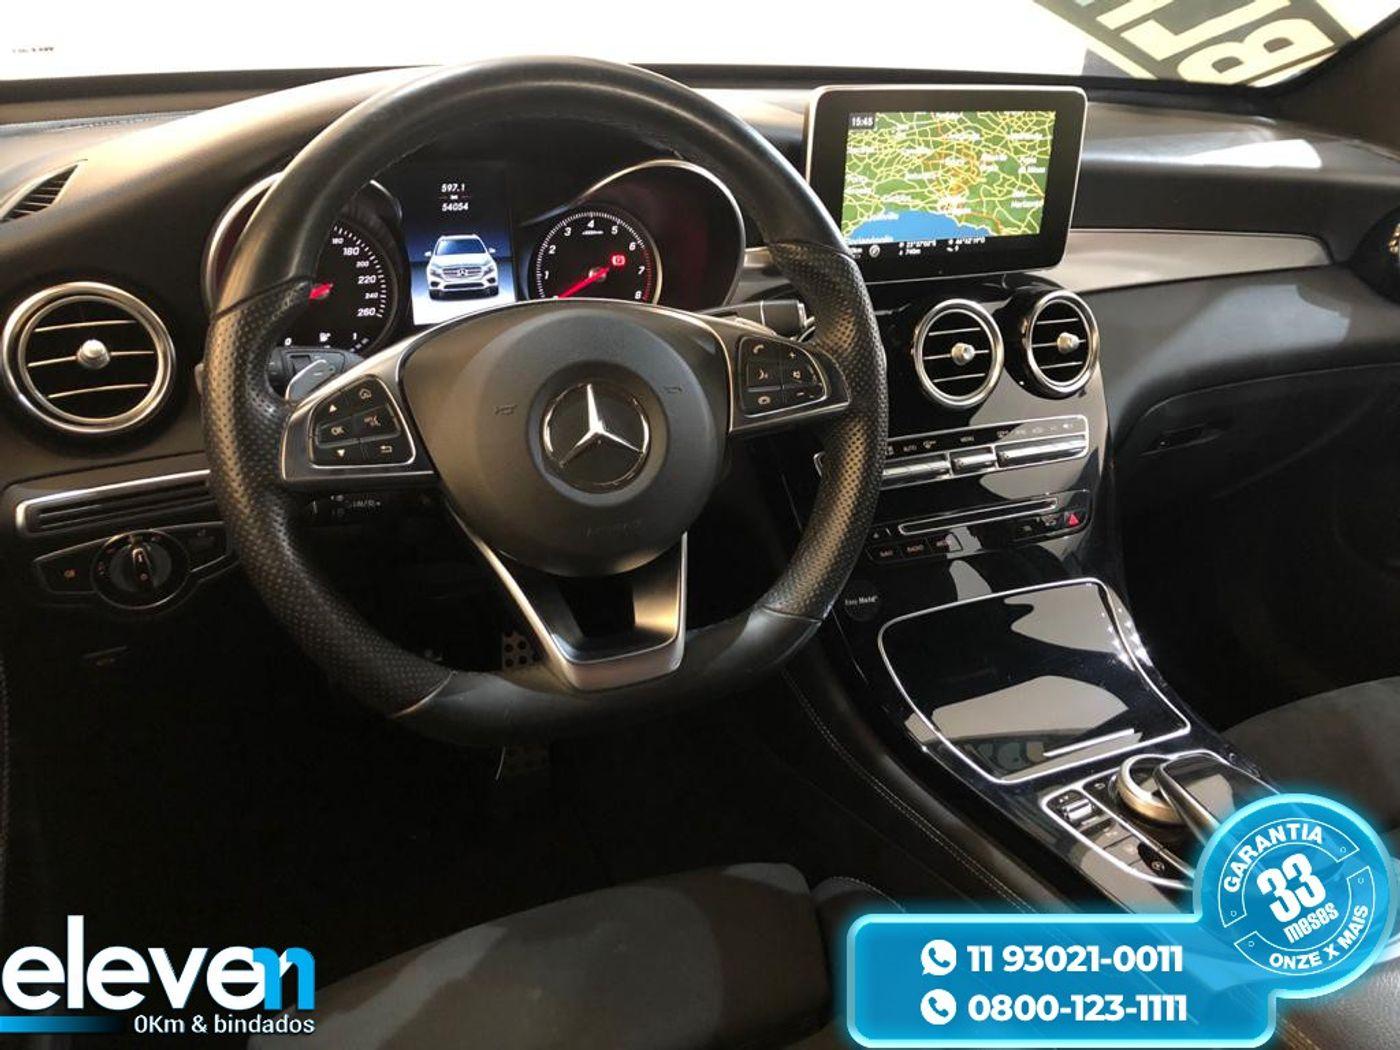 Mercedes GLC 250 4MATIC 2.0 TB 16V Aut.